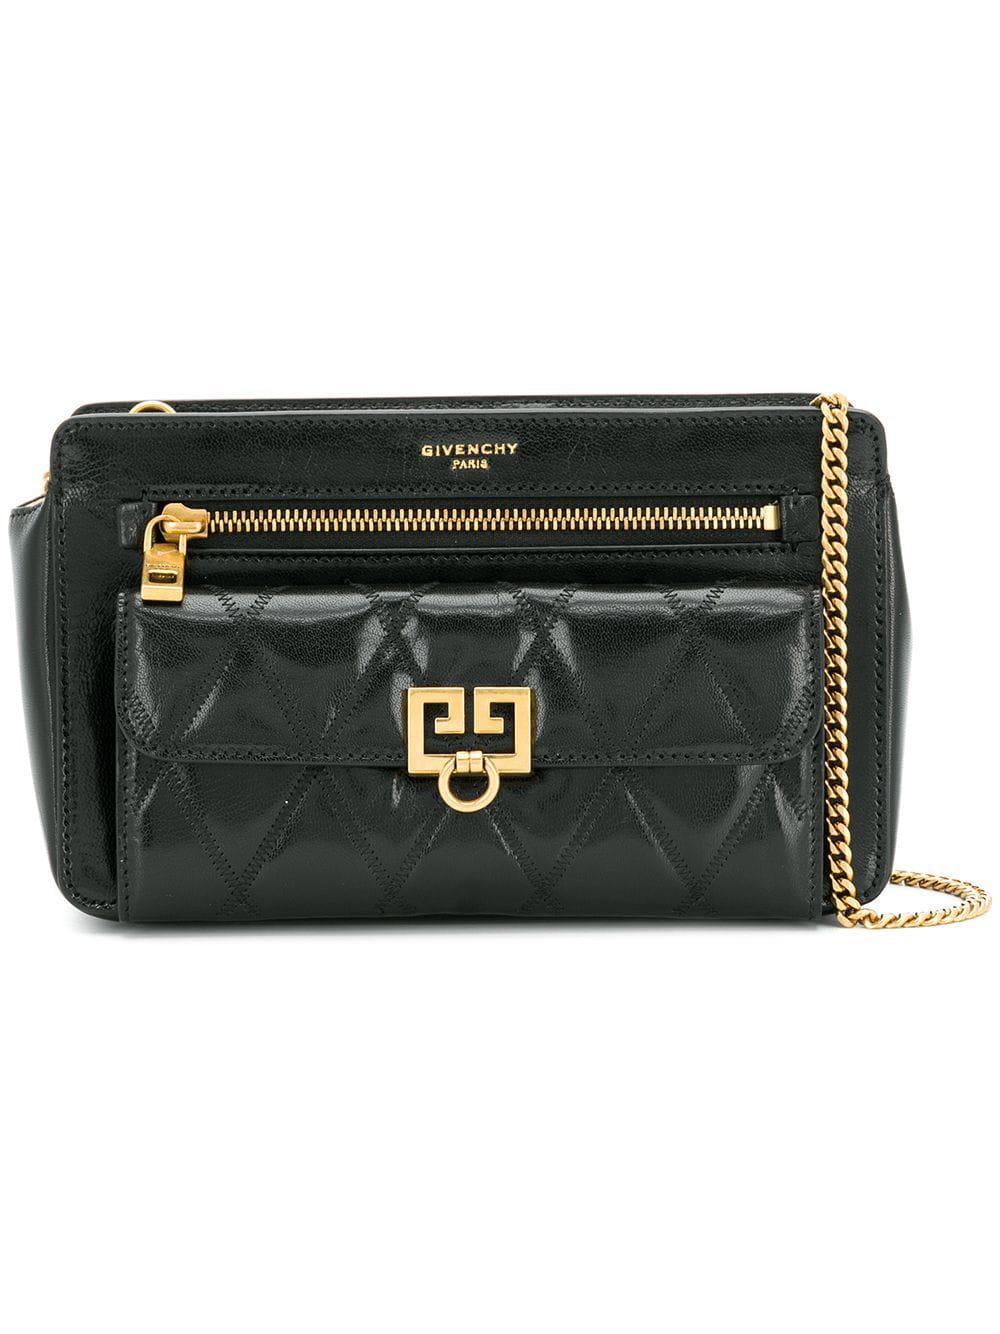 a32183631b7 Womens Black Pocket Leather Crossbody Bag release date  0e39d 27e43  Givenchy  Horizon Nano ...